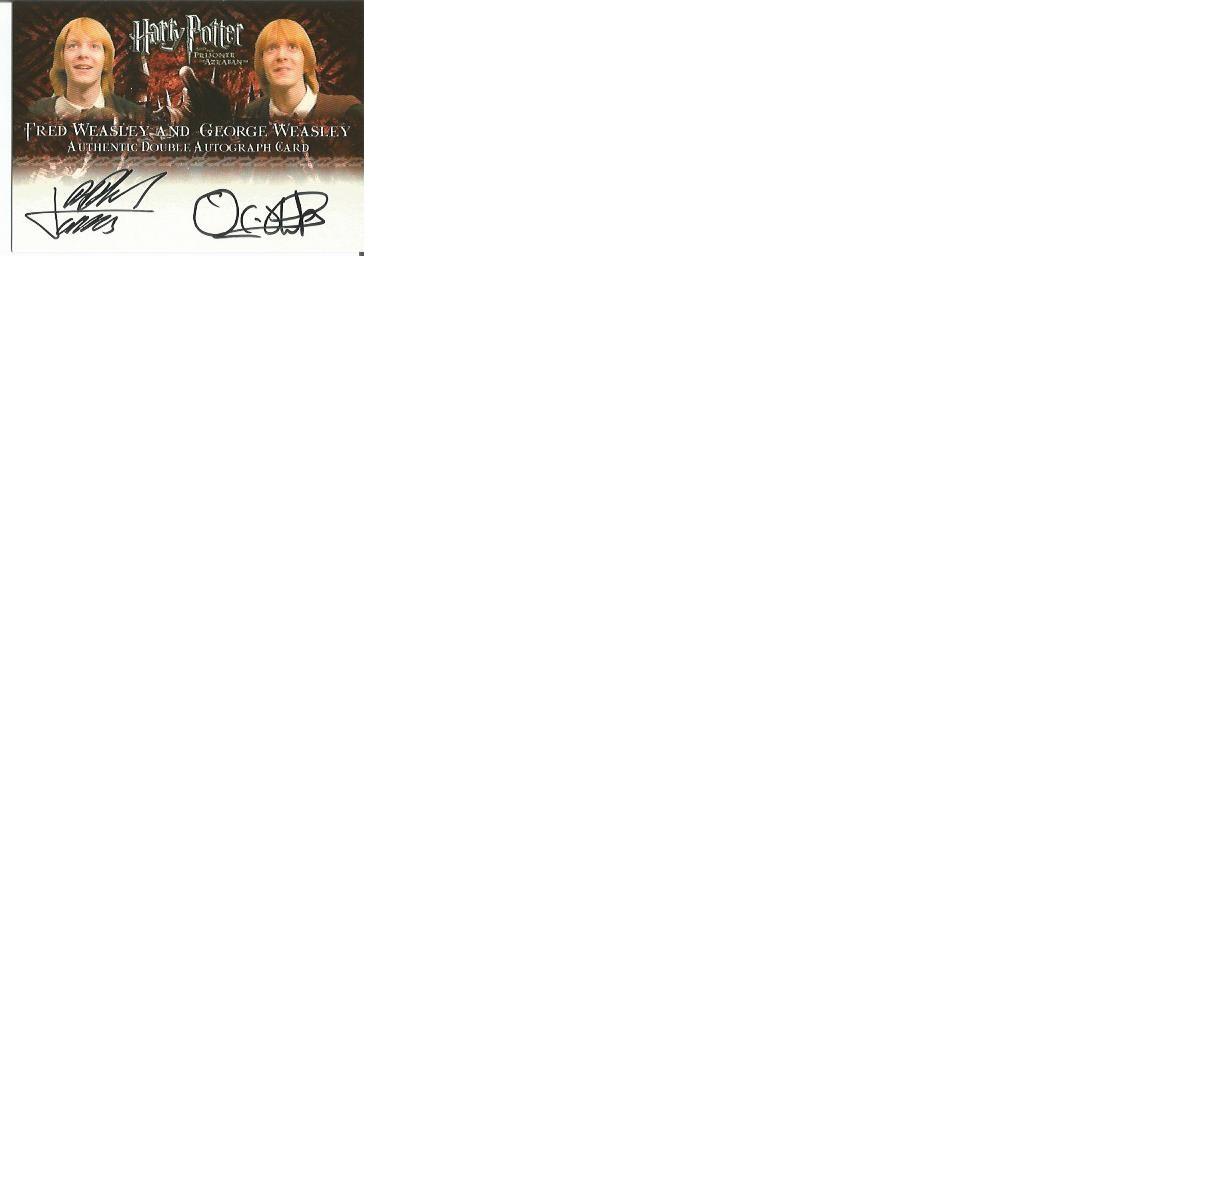 Lot 61 - James and Oliver Phelps signed Harry Potter Prisoner of Azkaban autographed Artbox trading card.